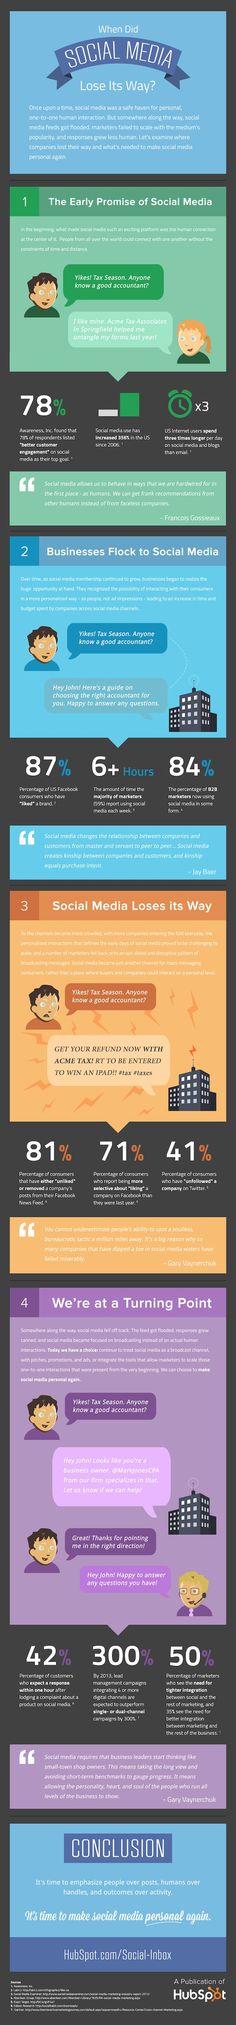 Social media lose its way?